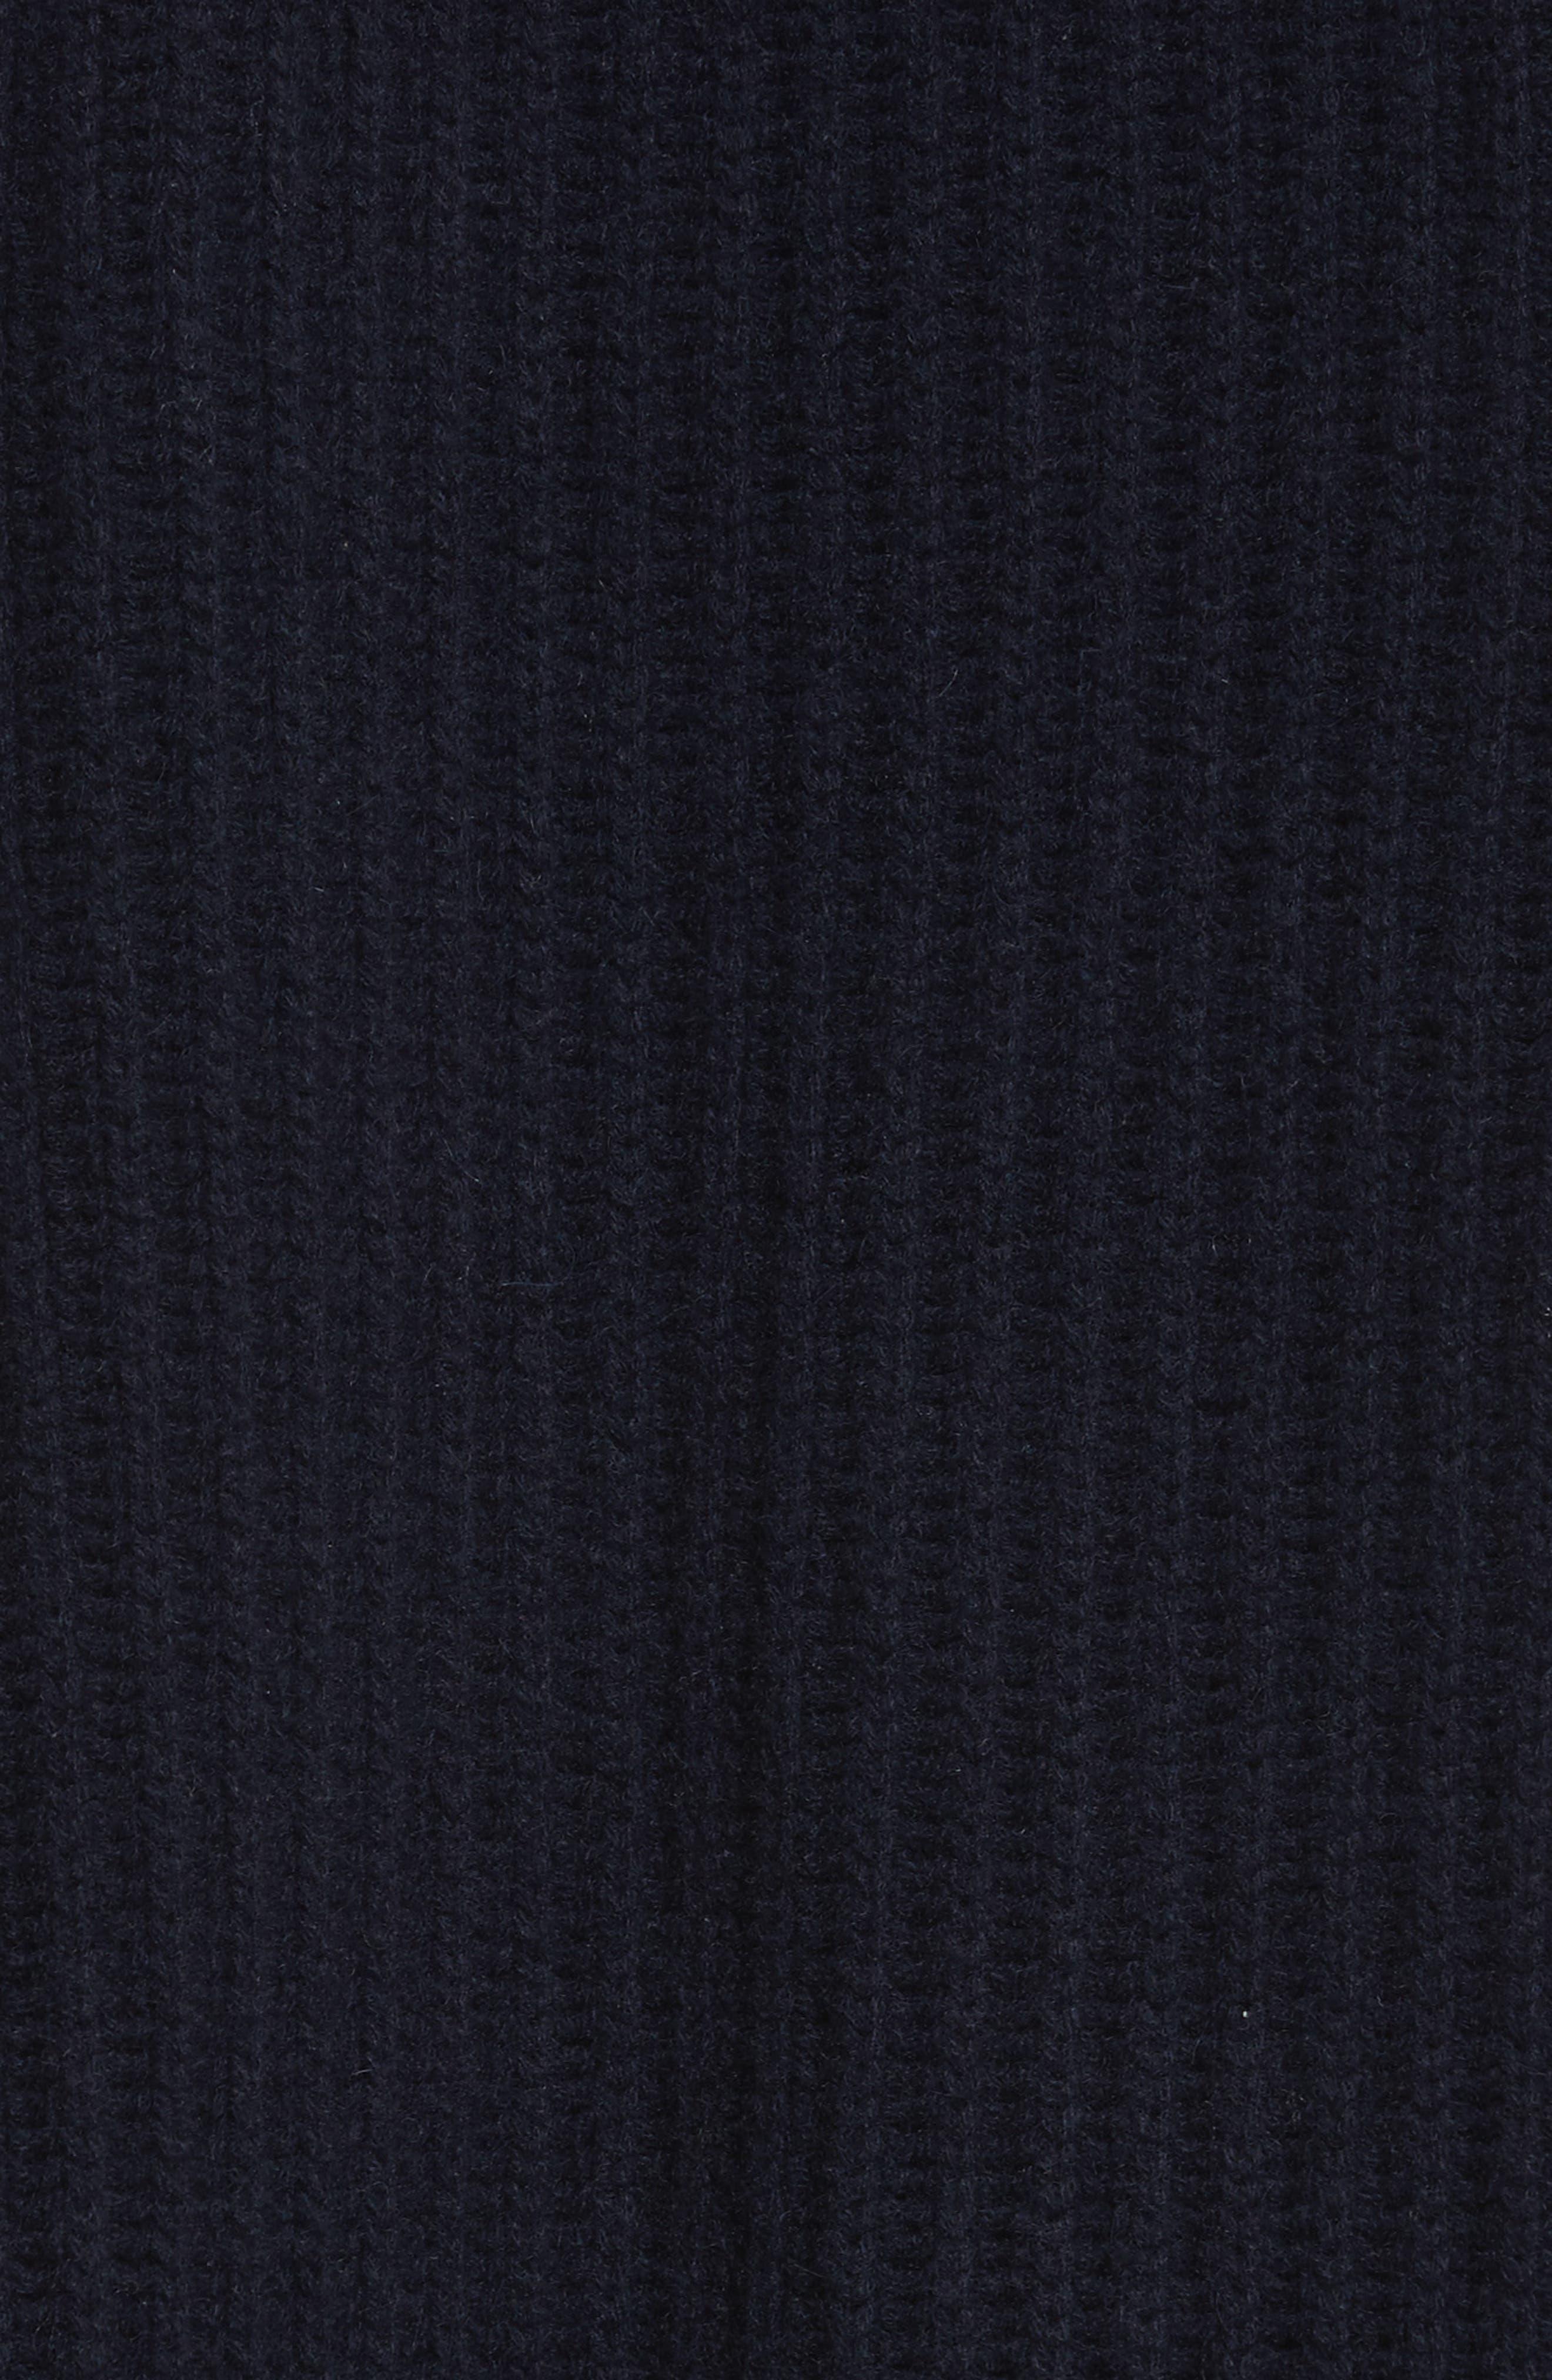 Rib Knit Wool Blend Cardigan,                             Alternate thumbnail 10, color,